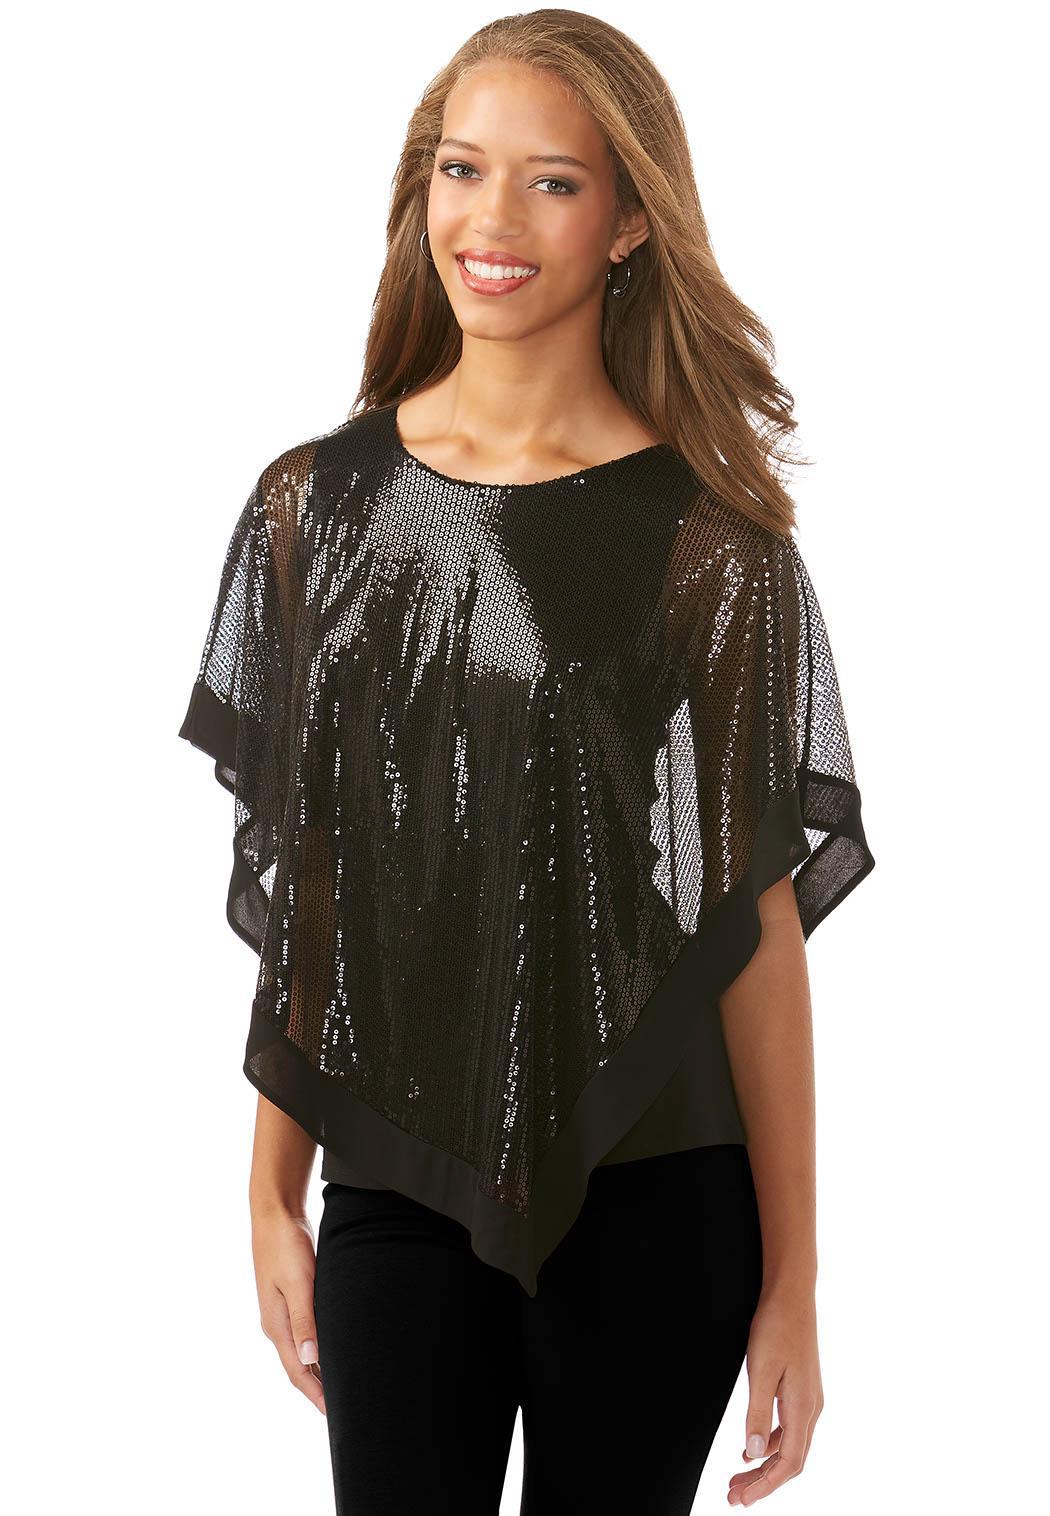 Cato fashions for Handkerchief shirt plus size